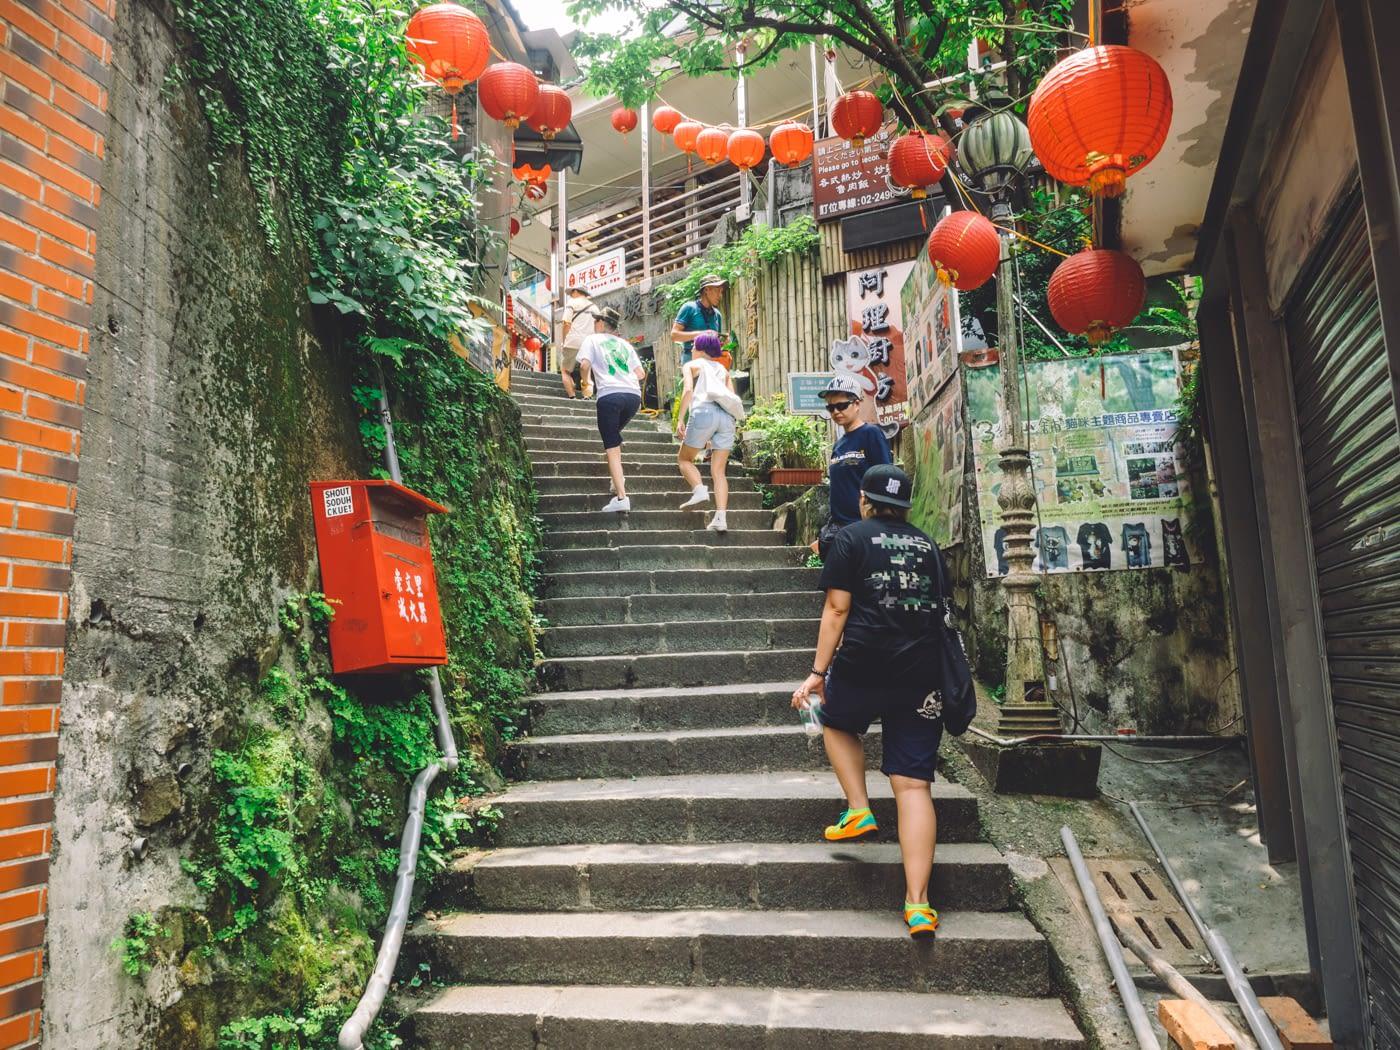 Taiwan - Shifen - Stairs to more shops